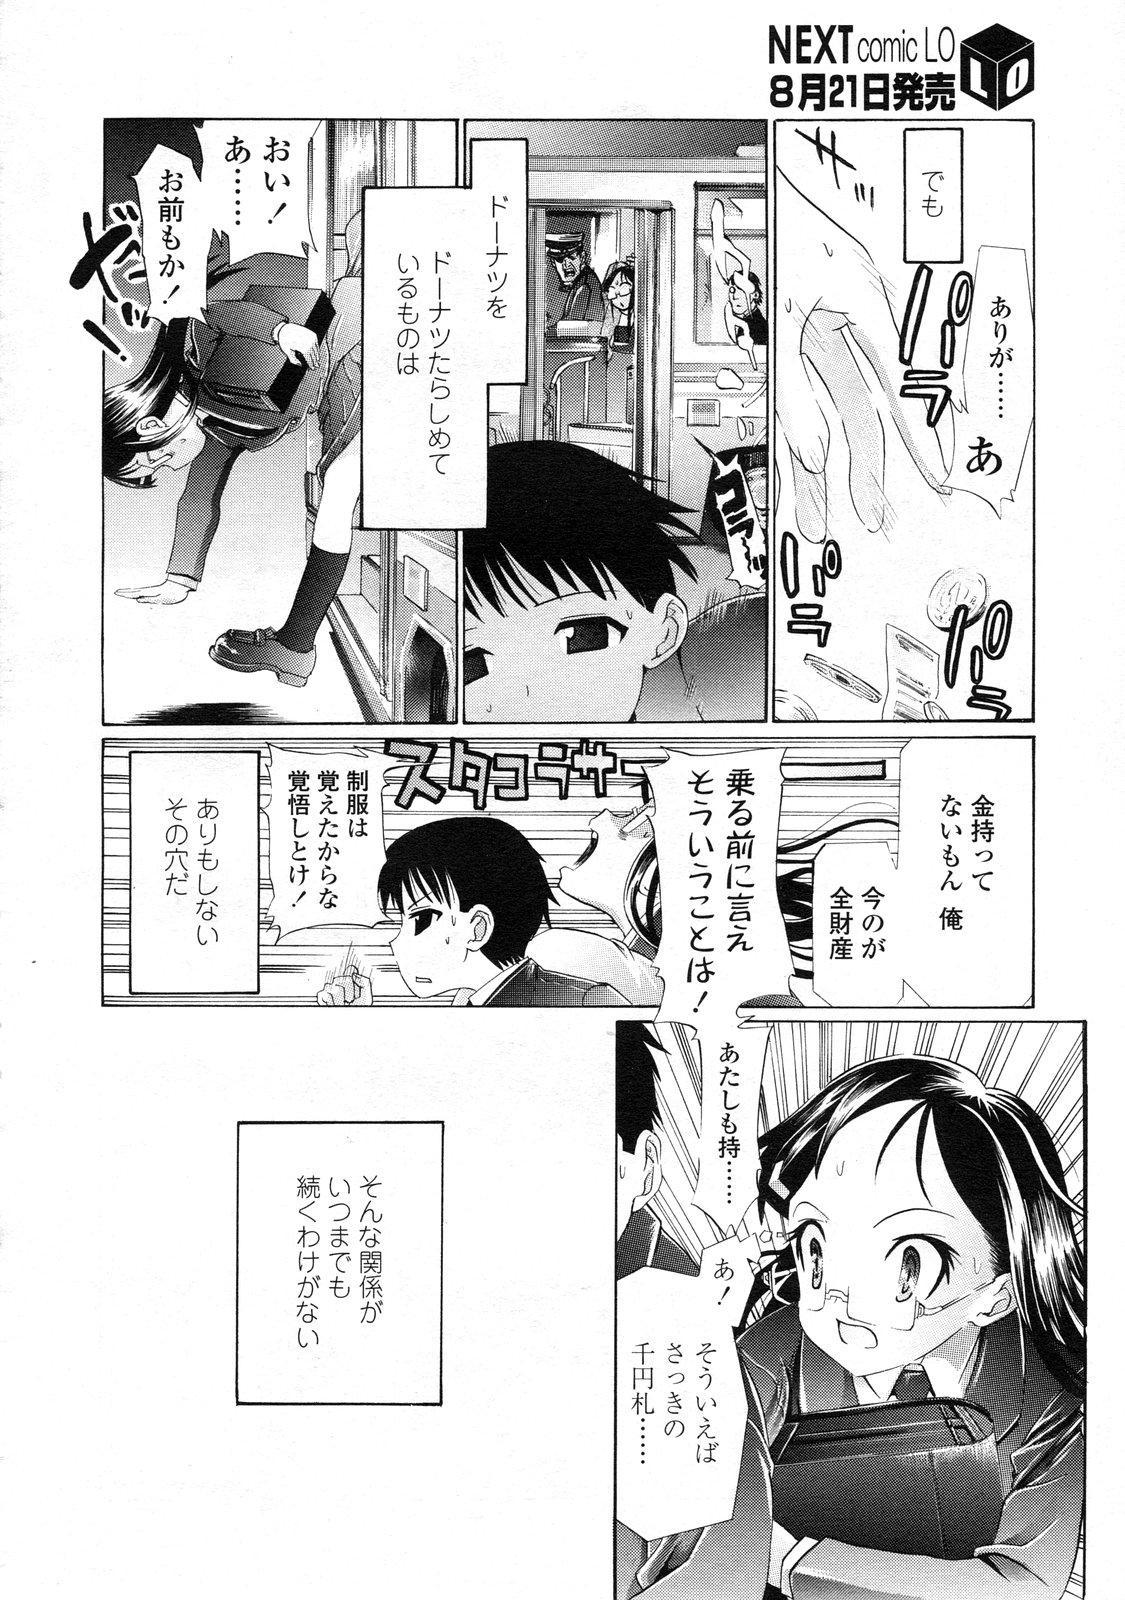 COMIC LO 2009-09 Vol. 66 330